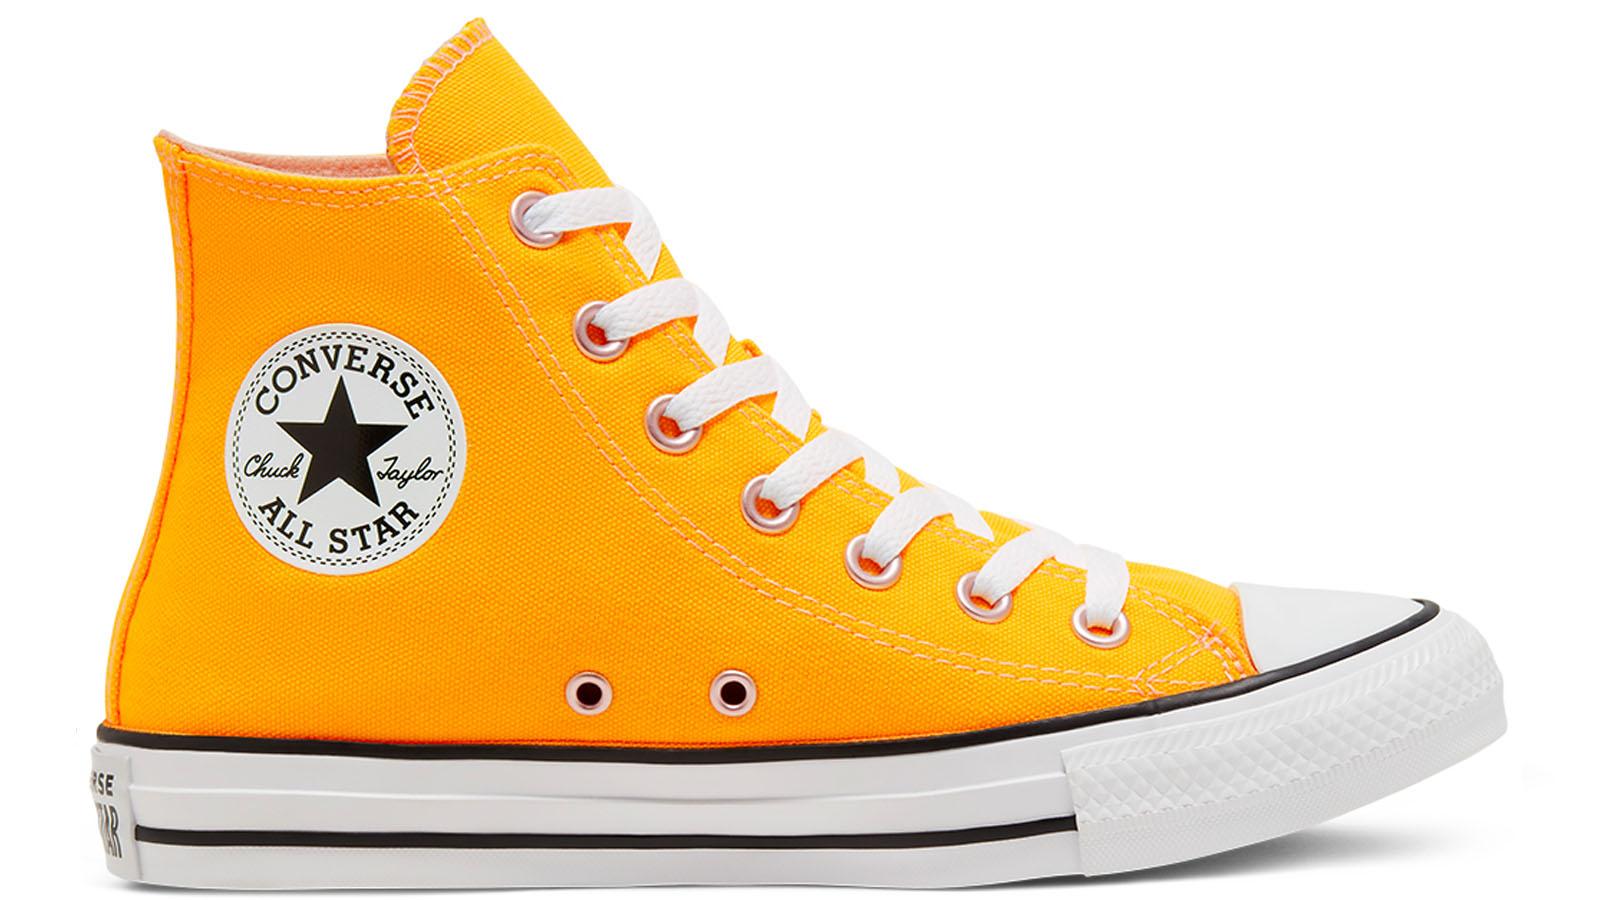 converse high top yellow